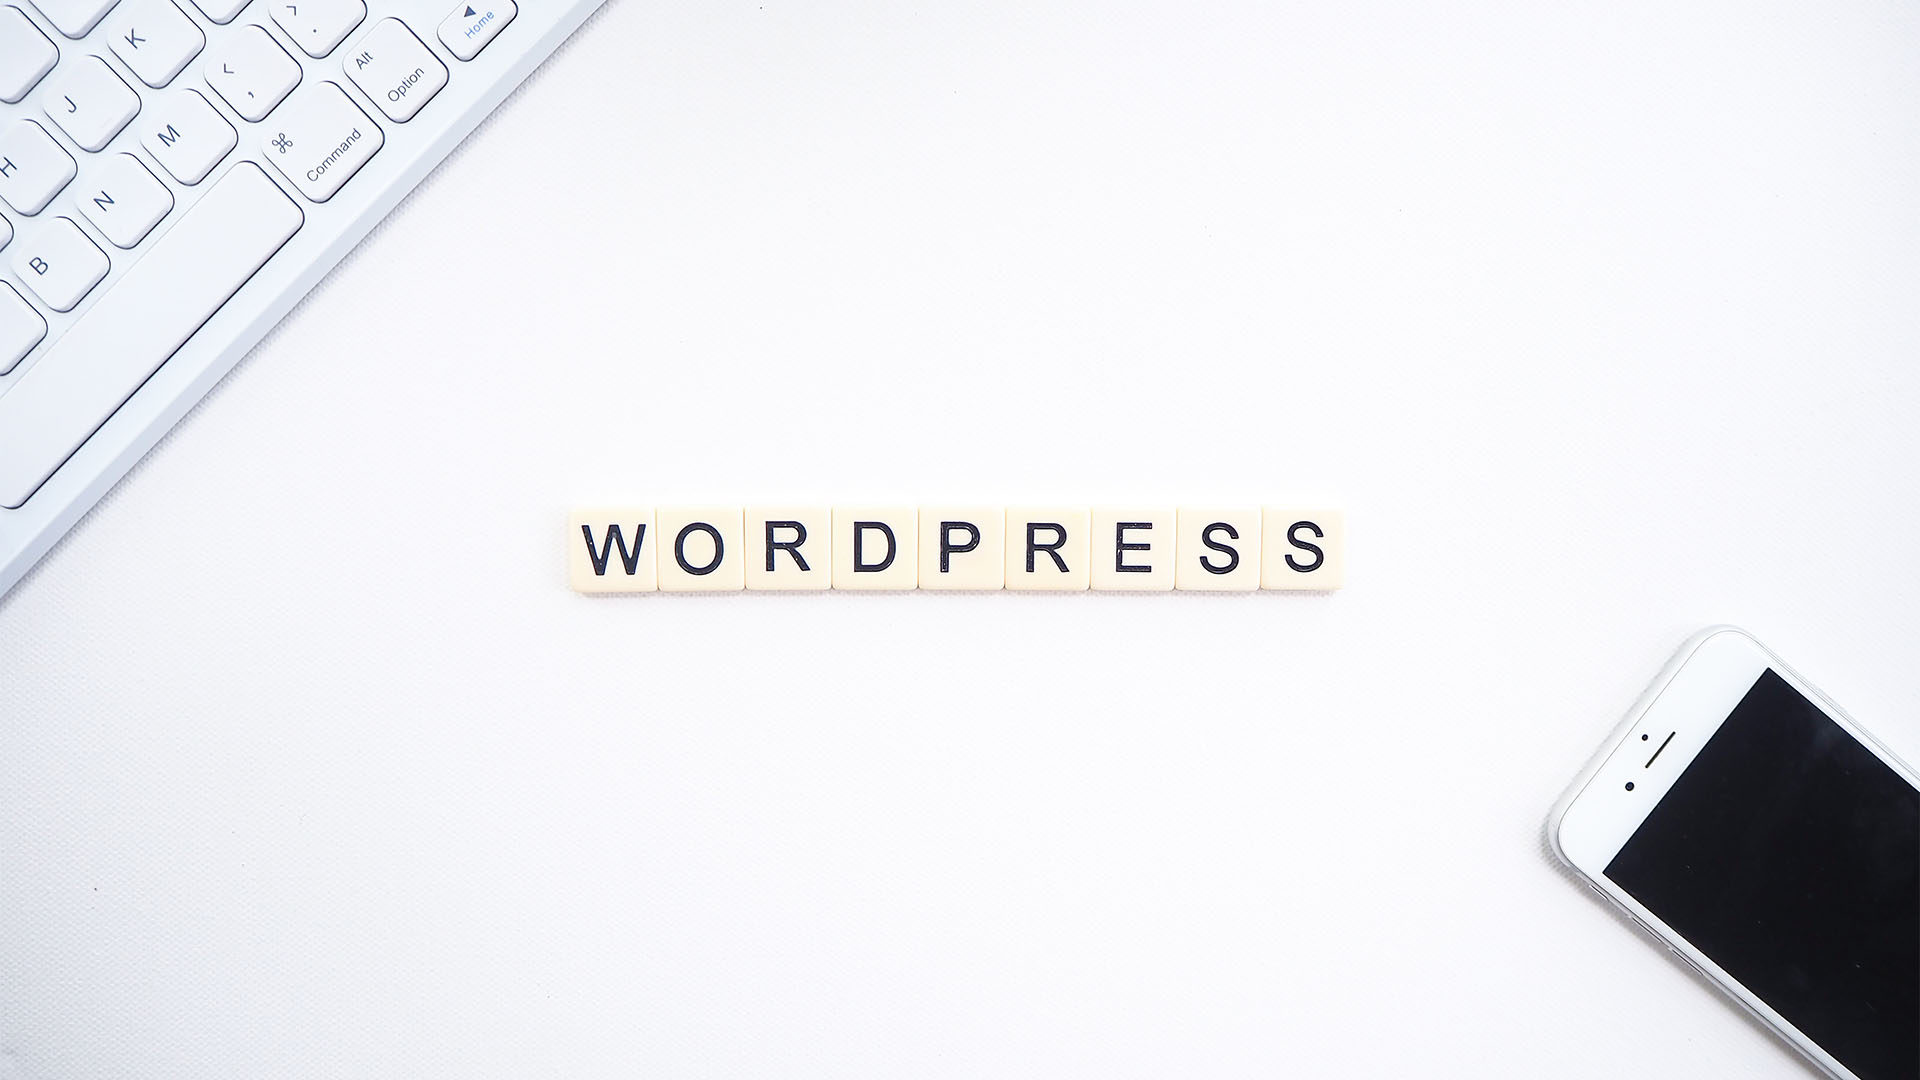 WordPress: Logging In, Navigating the Menu, and More Resources